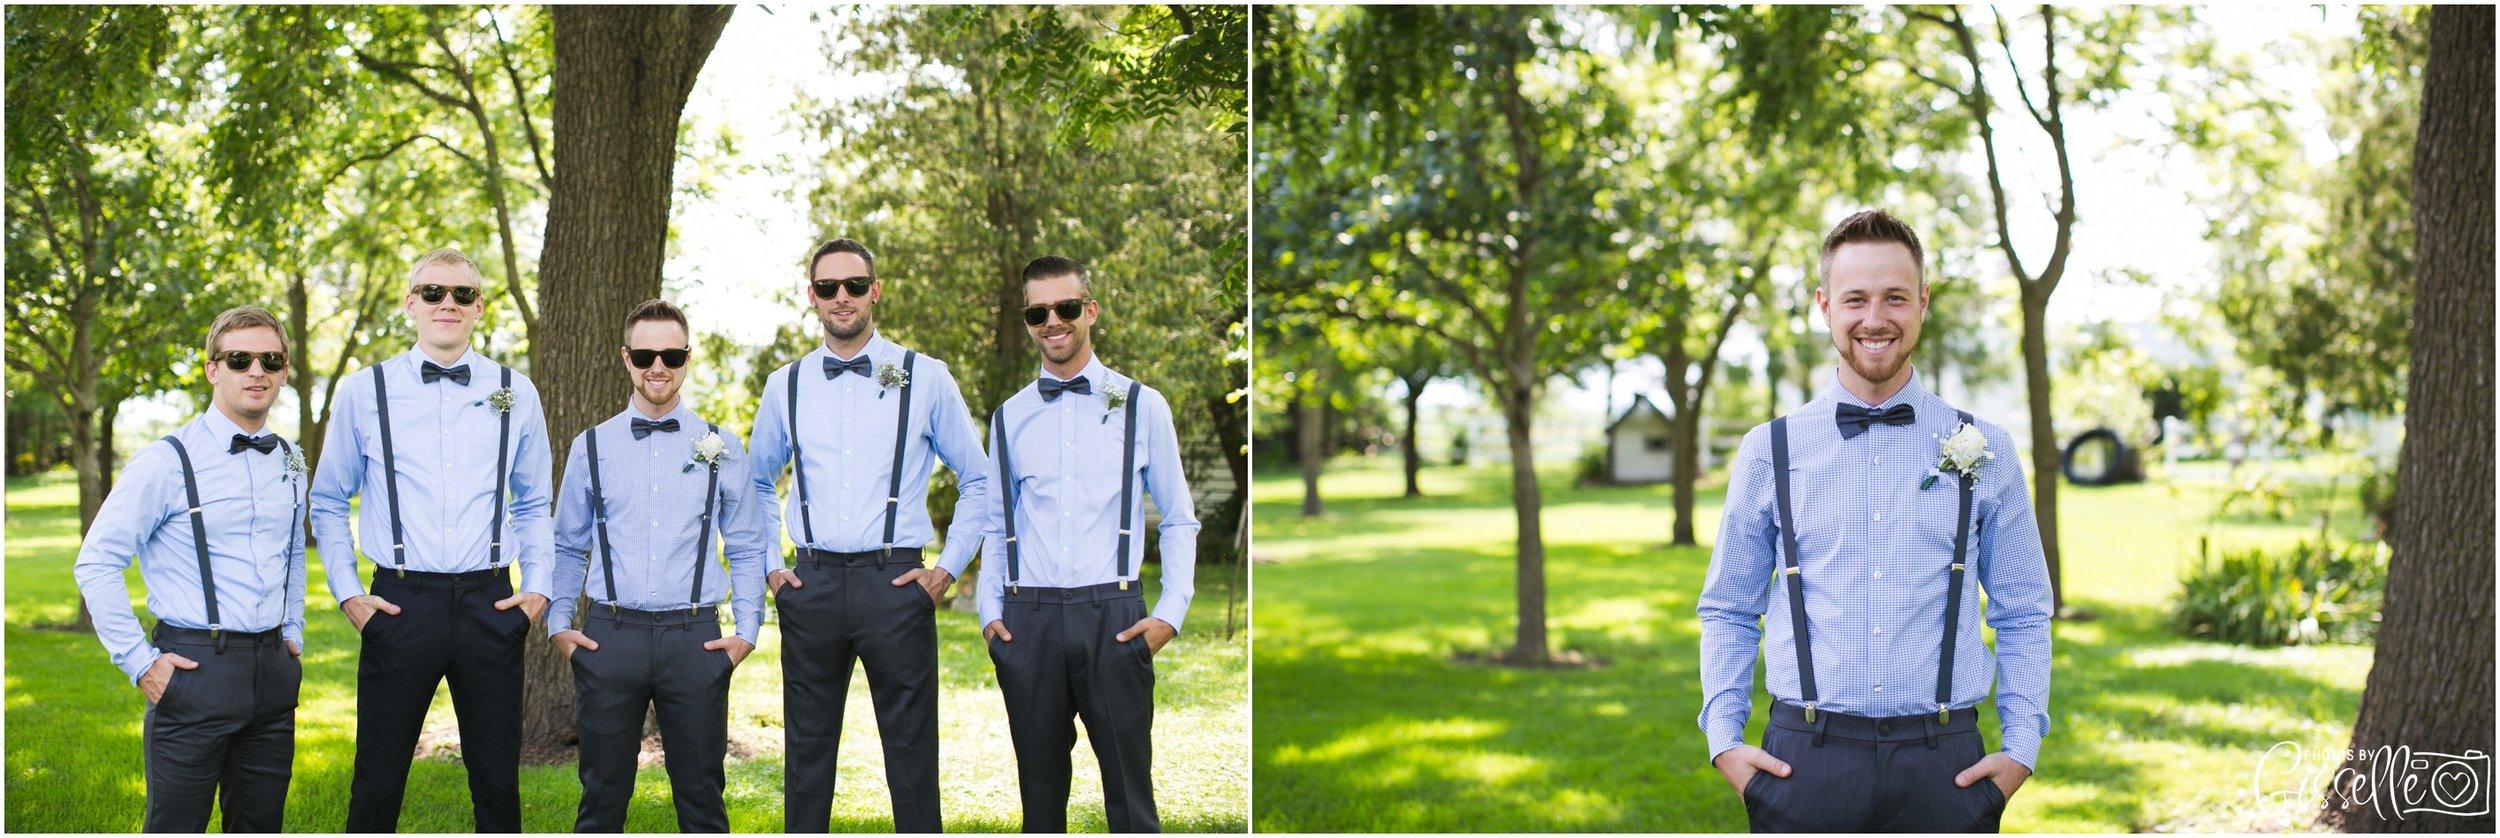 Northfork Farm Wedding_0387.jpg